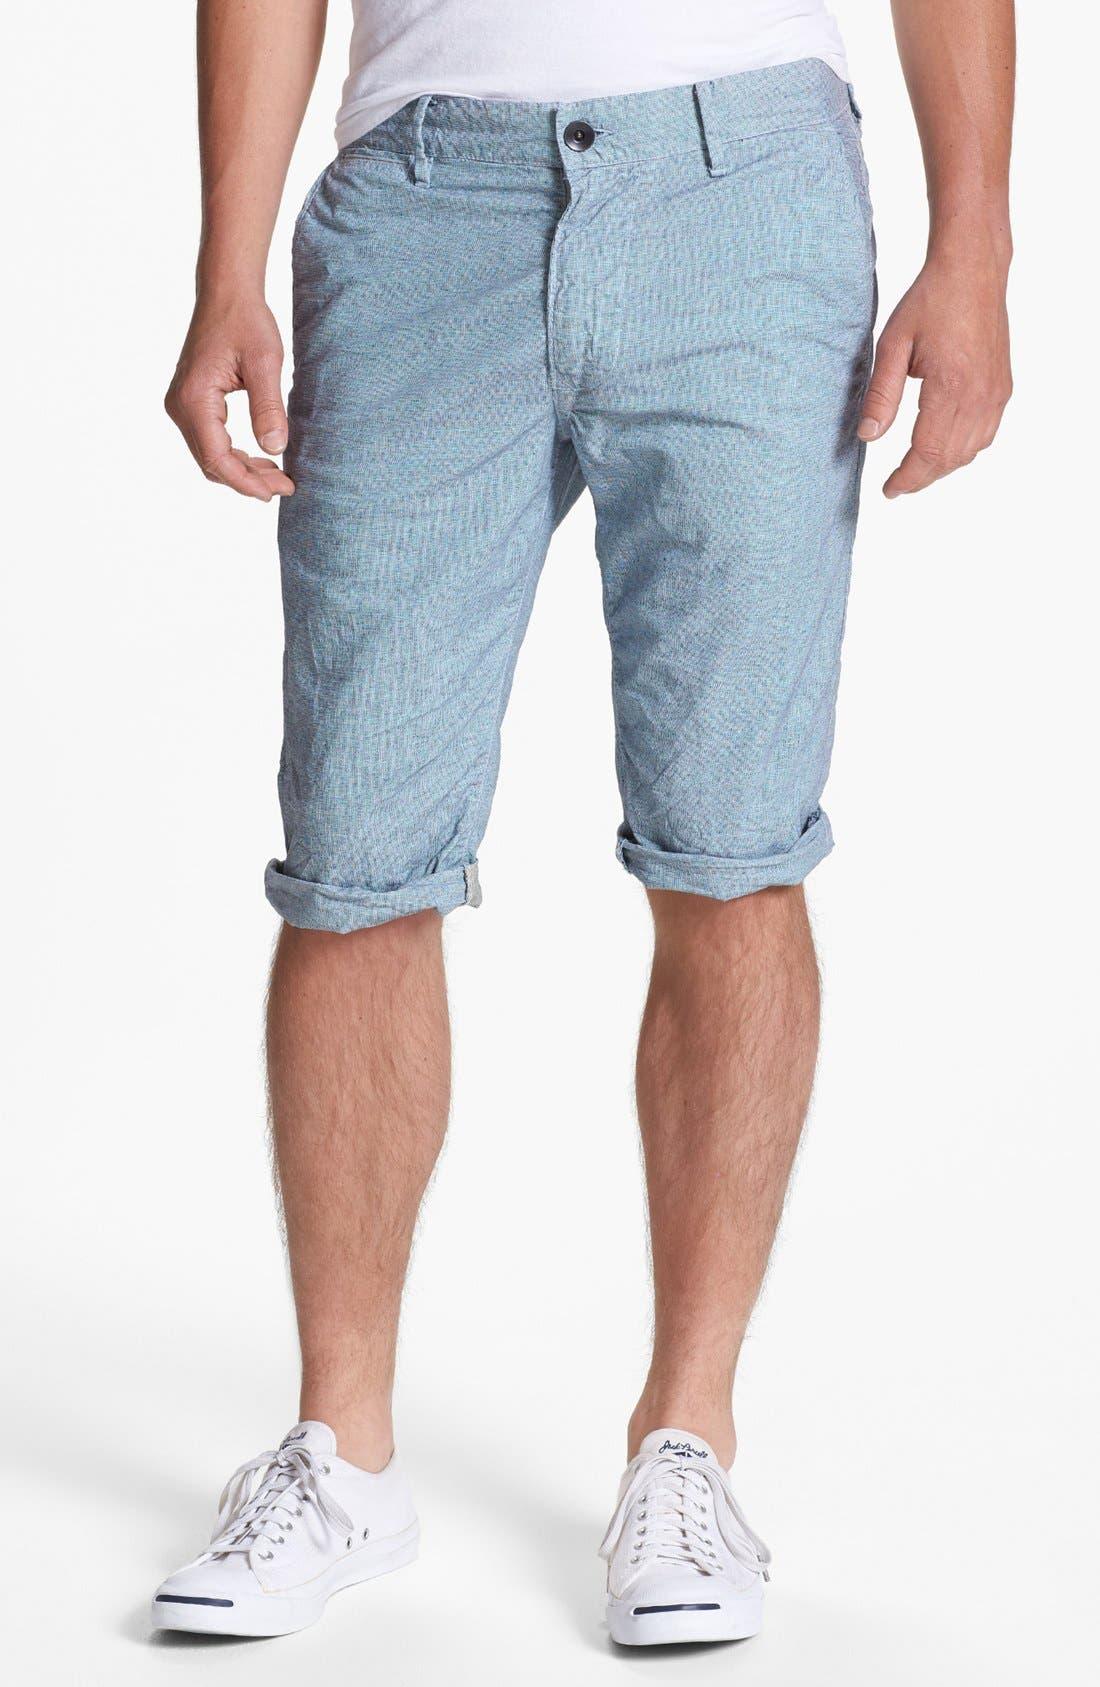 Main Image - Union 'Georgetown' Chino Shorts